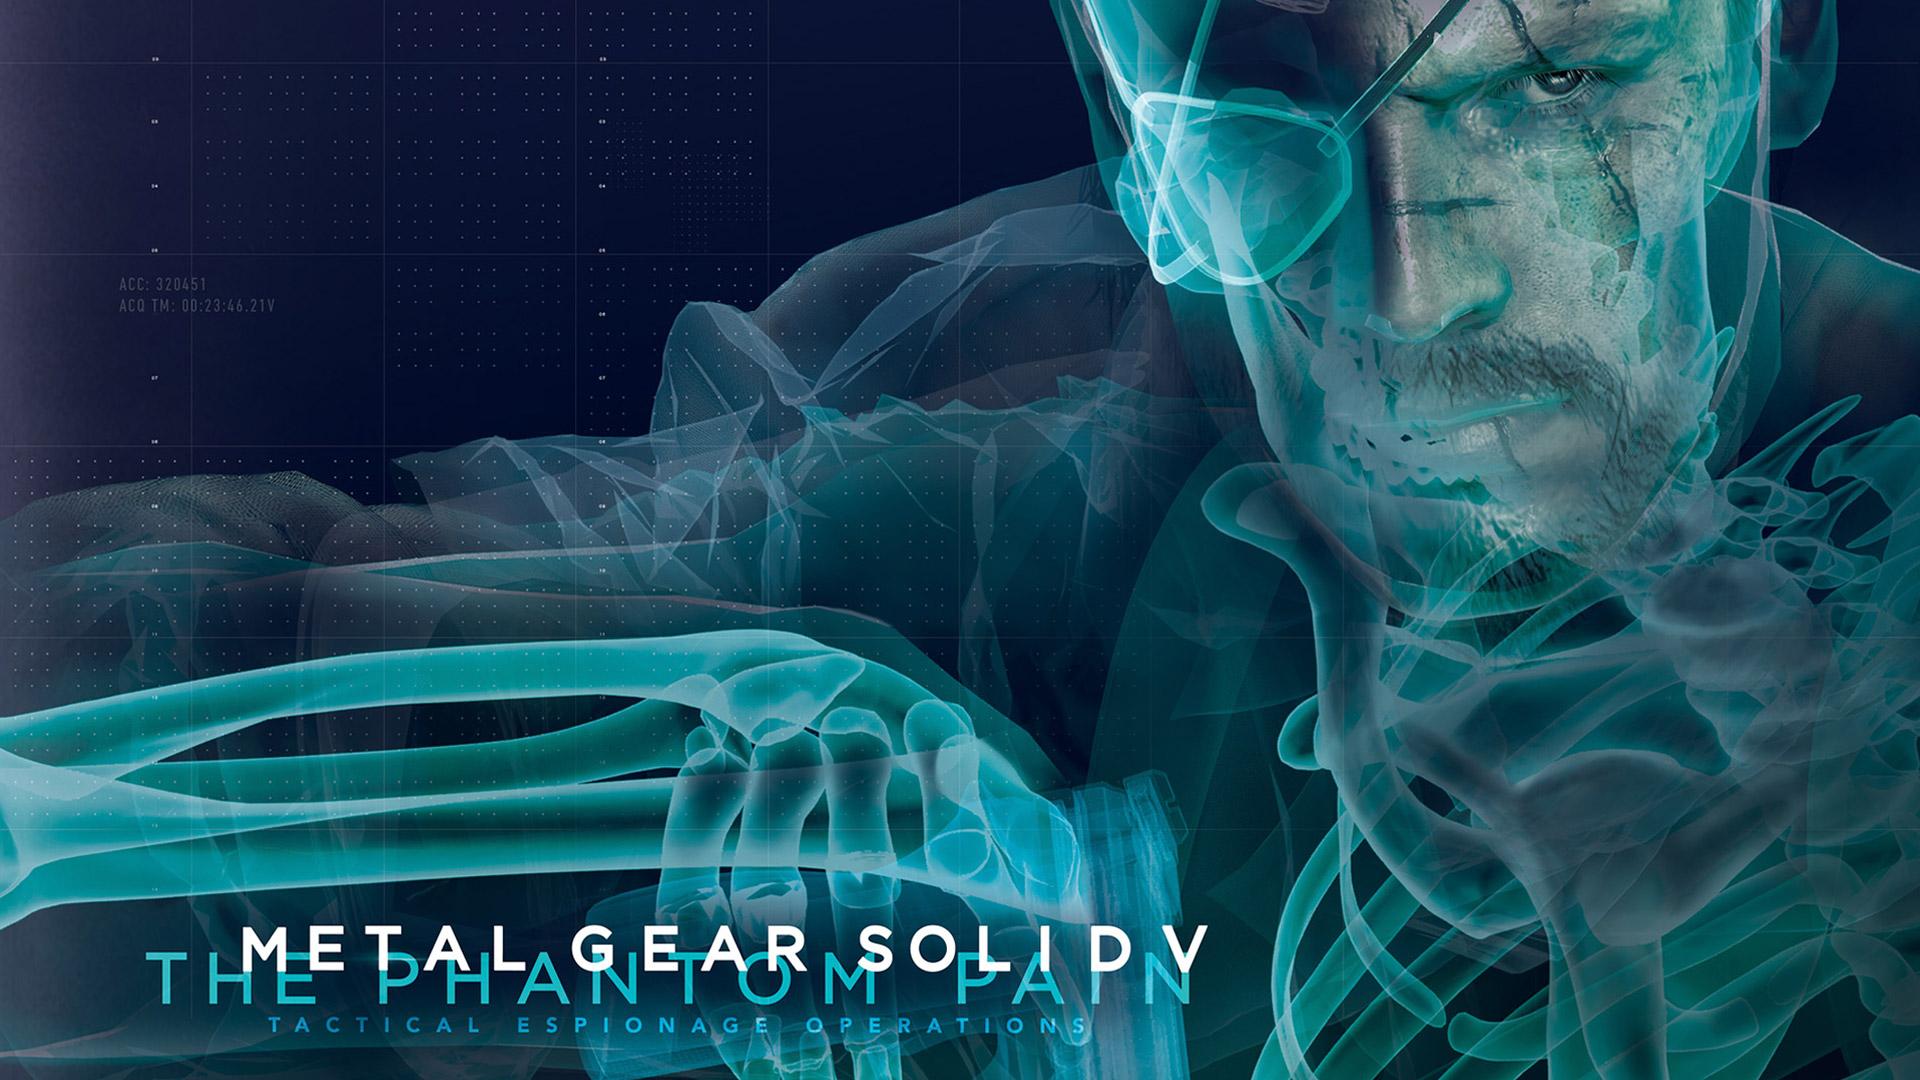 Metal Gear Solid V The Phantom Pain wallpaper 15